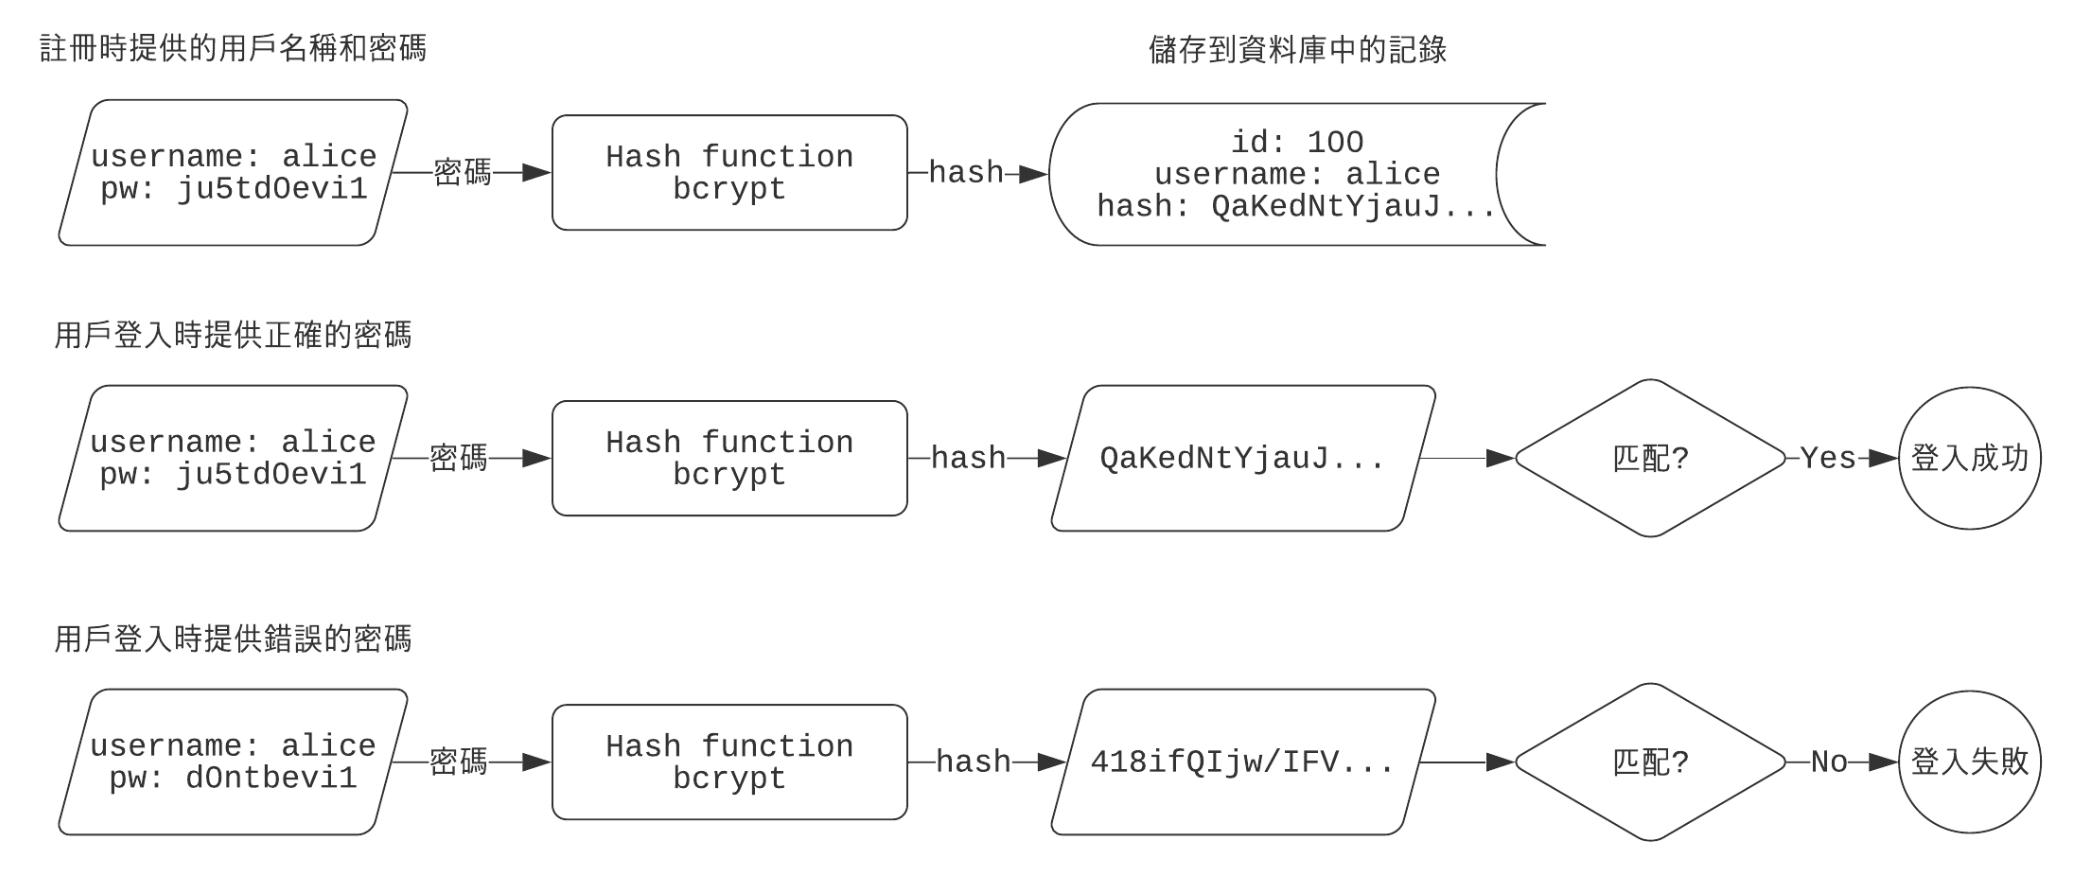 Figure 1: 把密碼明文輸入 hash function 進行運算, 在資料庫中只儲存 username 和 hash value。用戶登入時只需重新運算 hash value 並對比資料庫中的字串。